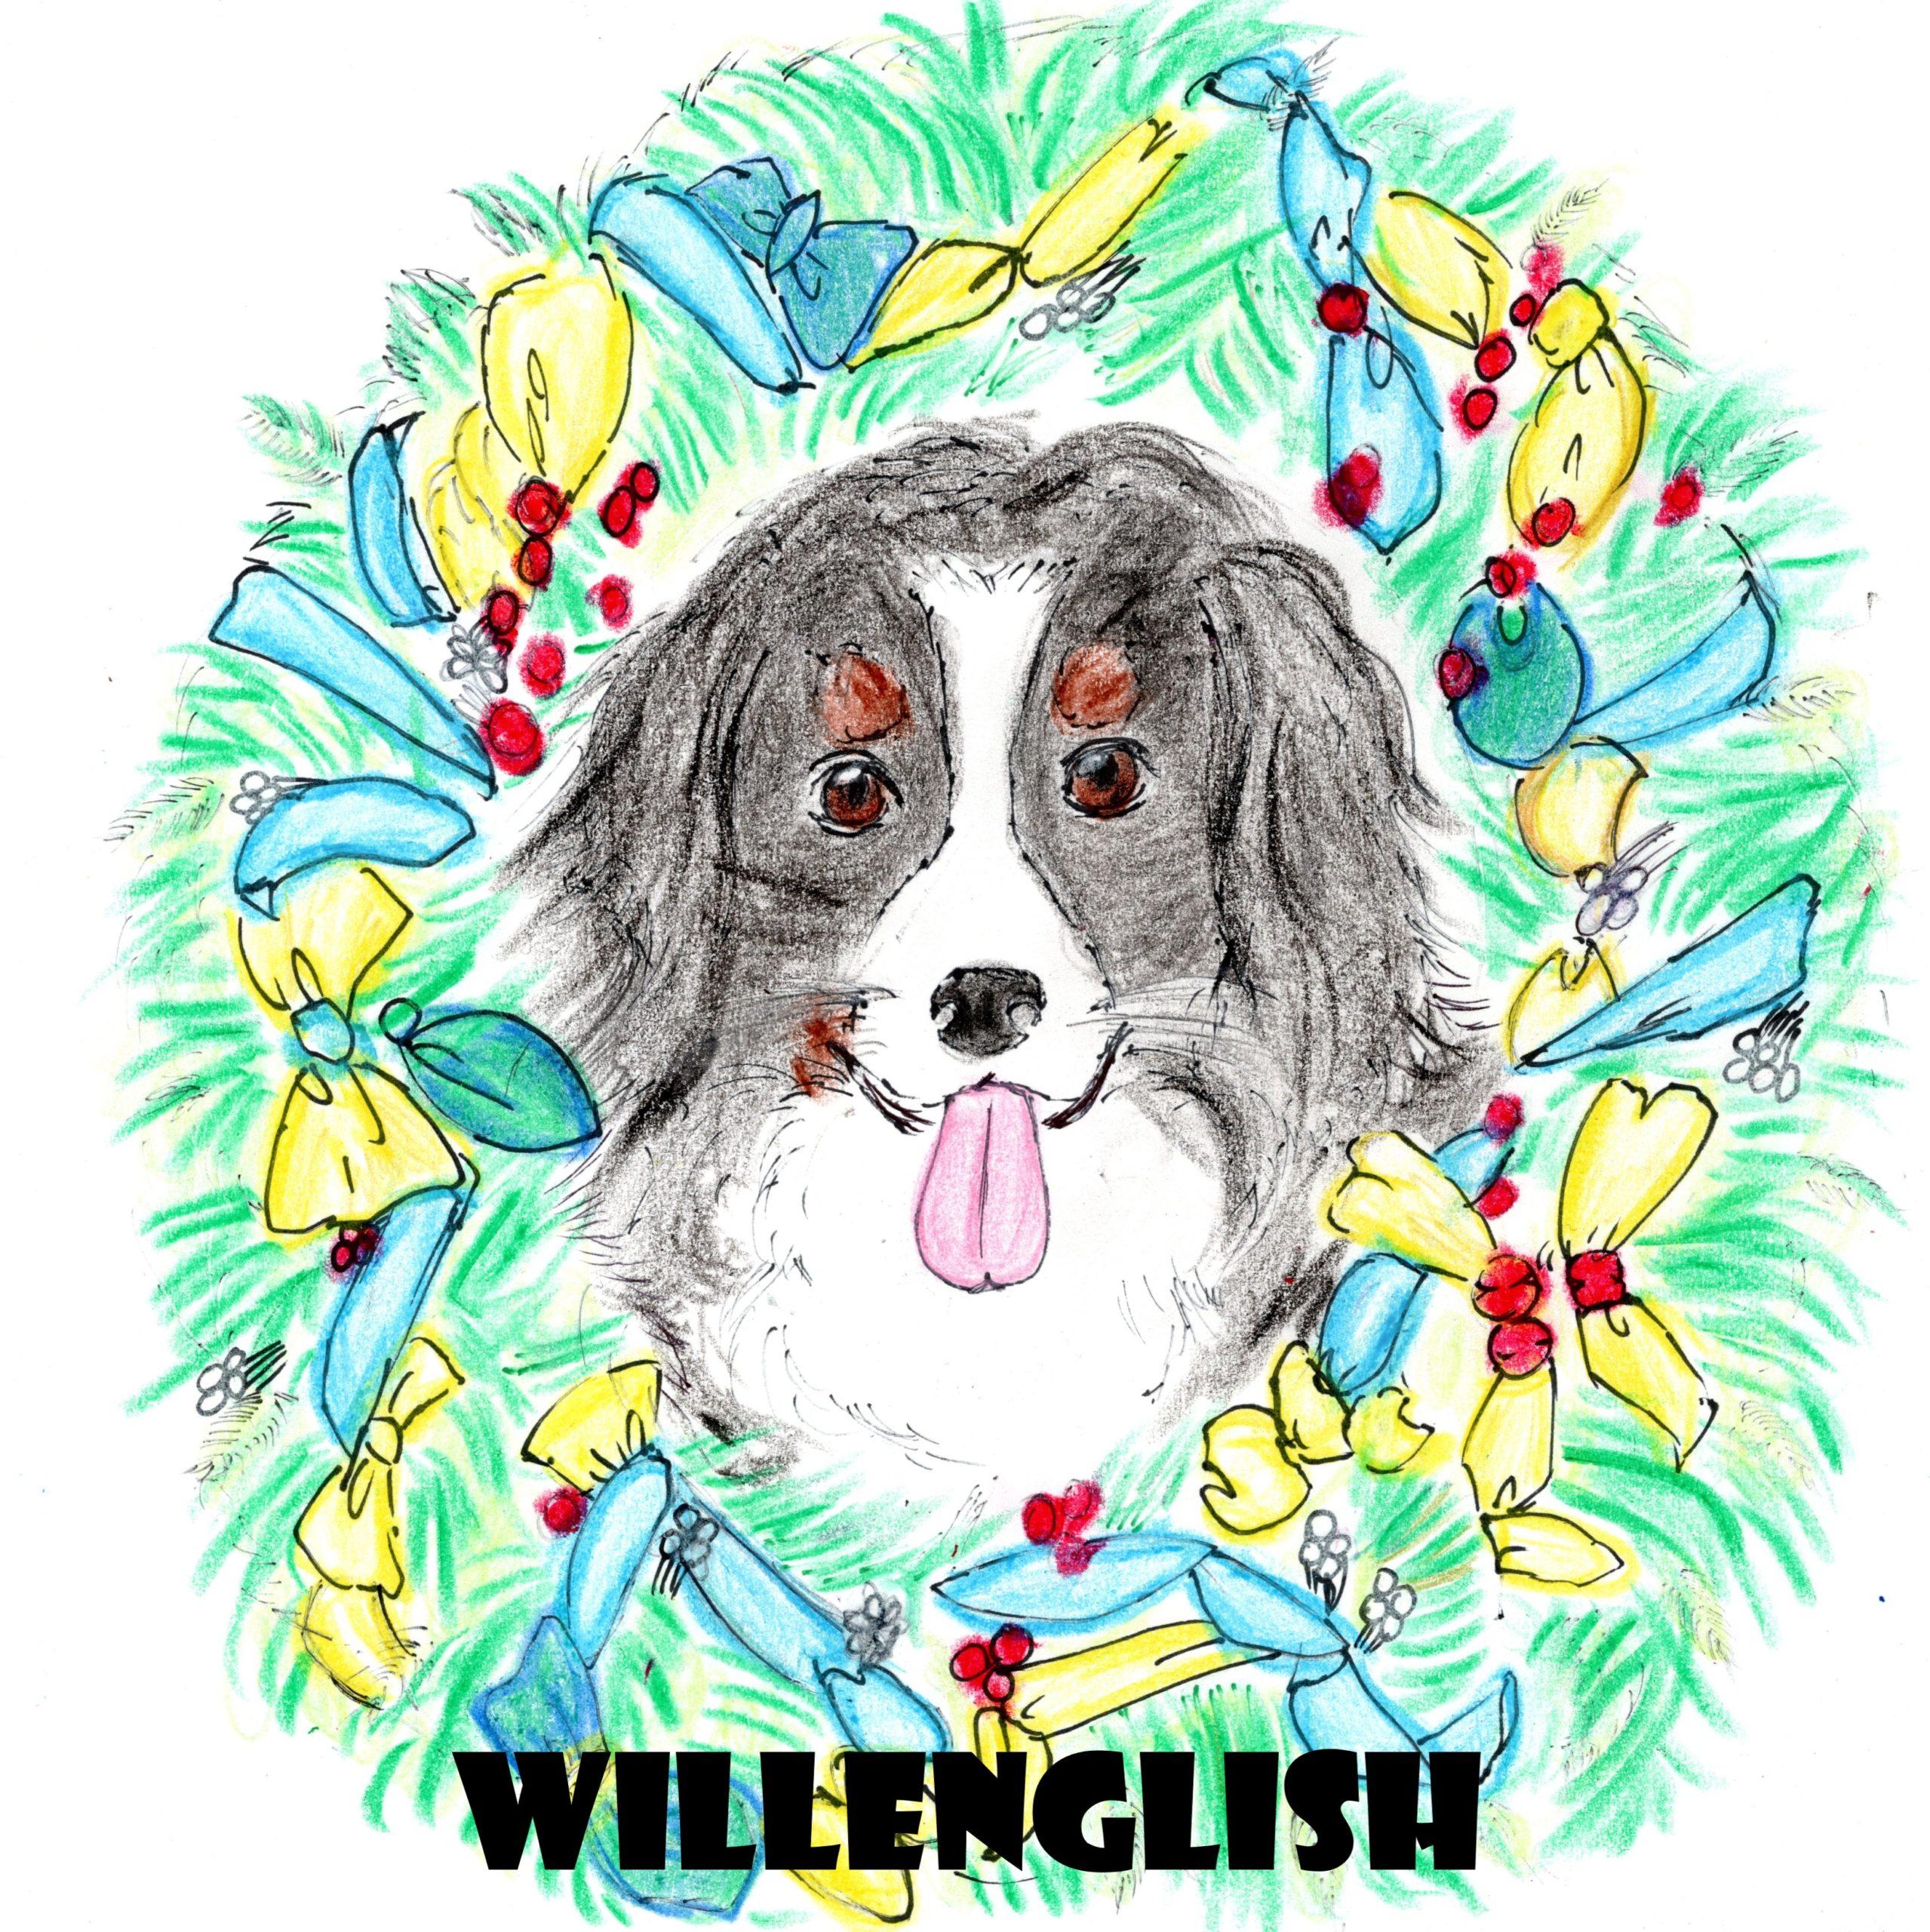 WiLLEnglish(ウィルイングリッシュ)~宇都宮市の英語教室~